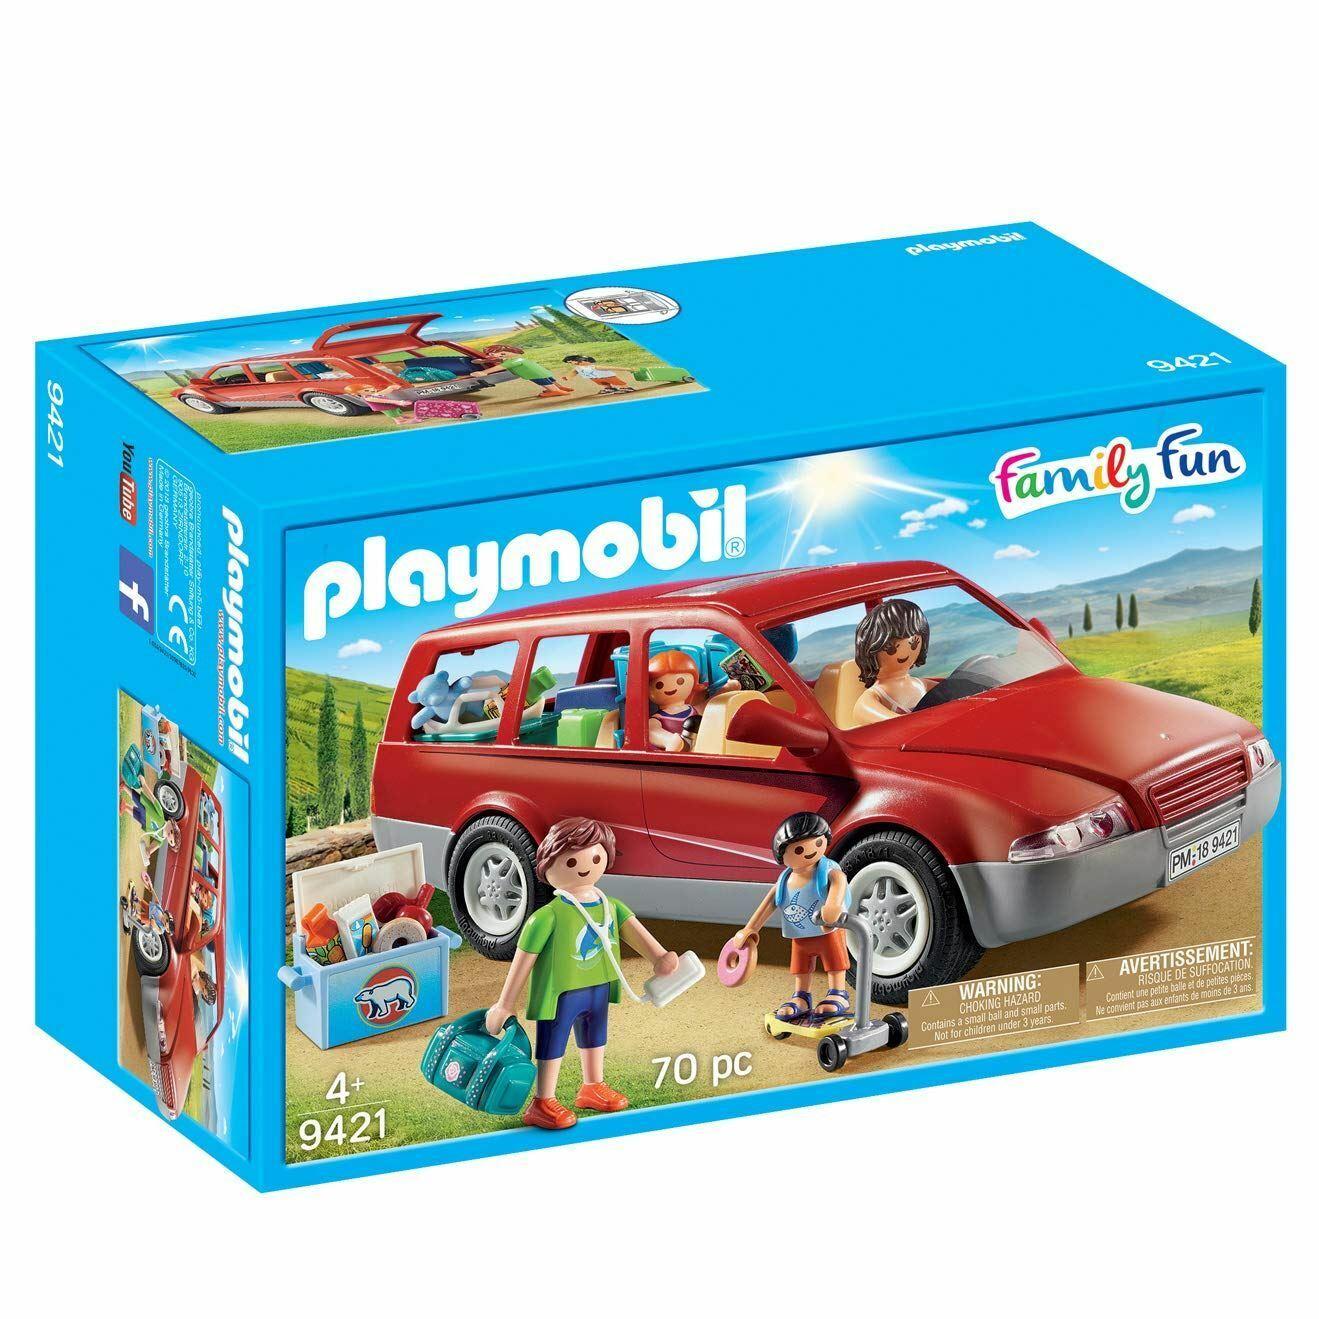 Playmobil 9421 Fun Family Car with Trailer Hitch, Various